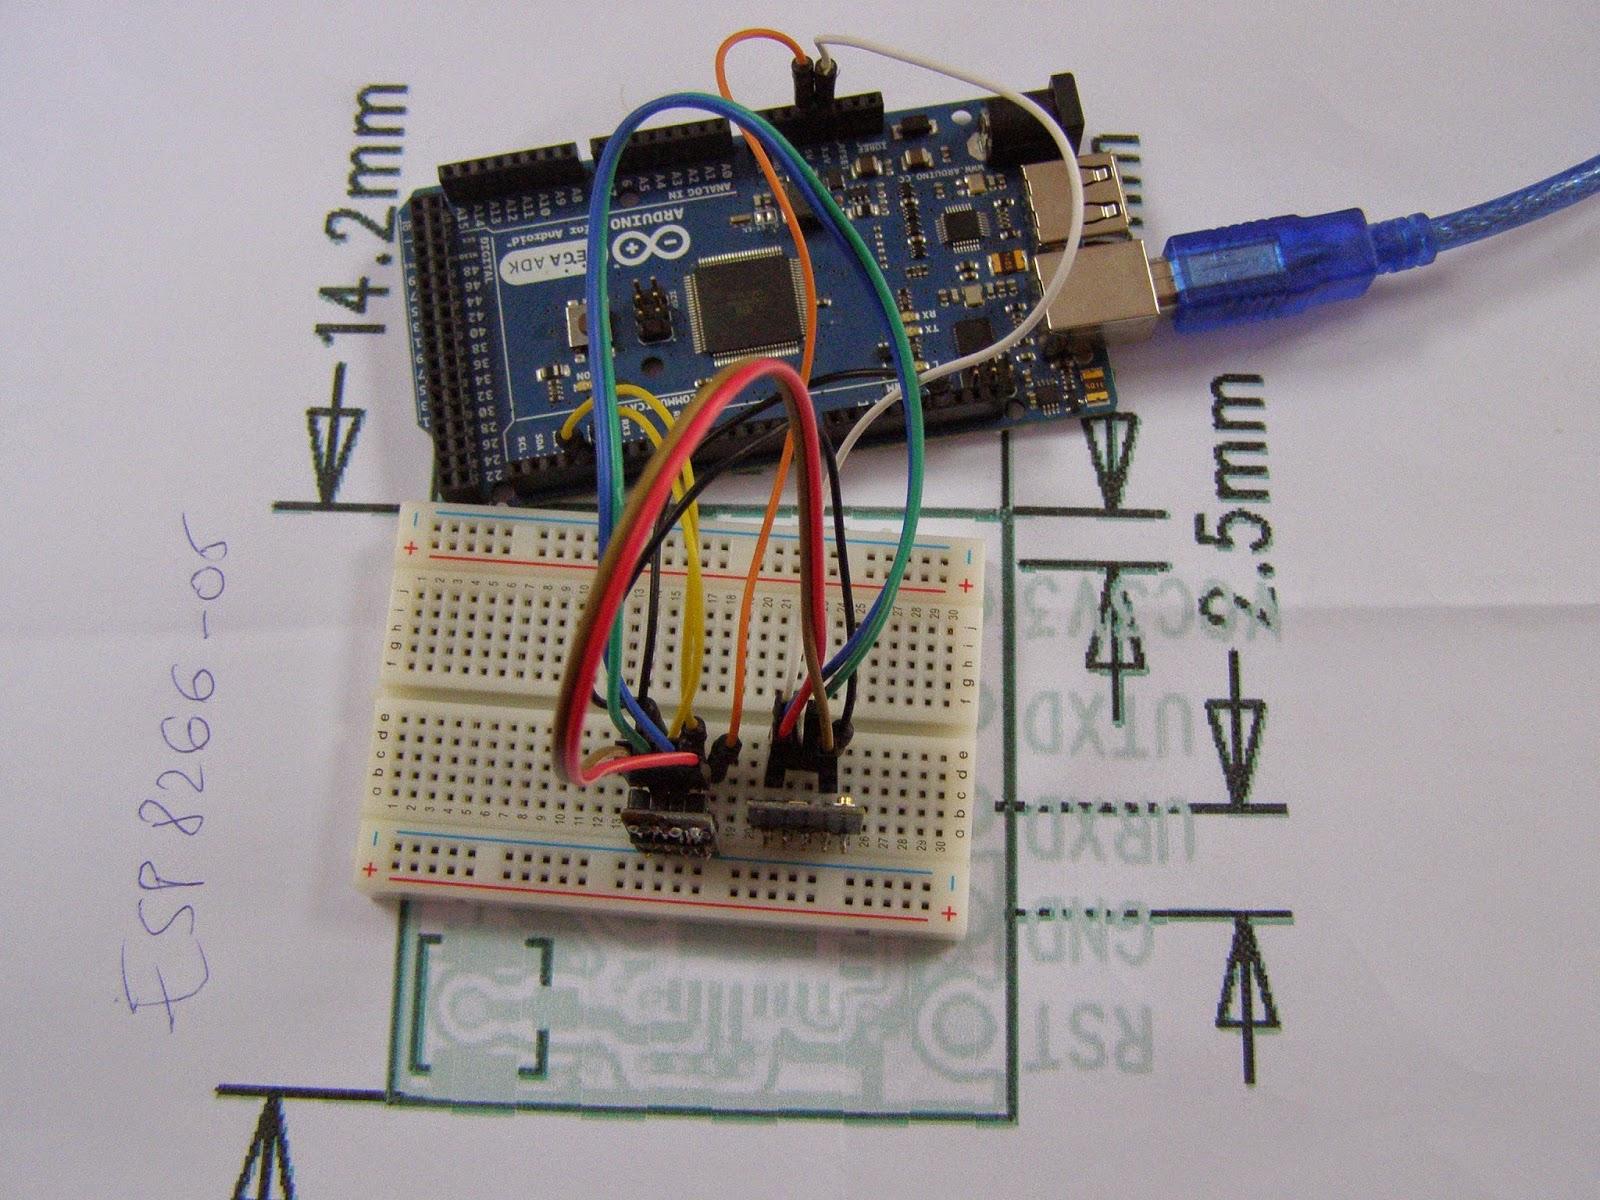 Nicu Florica Niq Ro Modulul De Retea Uairles Esp8266 05 Si Arduino Circuit Pic16f628 Rf Remote Buton 433mhz Button Deoarece E Mai Usor Sa Verific Pe Ecranul Monitorizare Seriala Iar Se Conecteaza Serial Adica Prin Rx Tx Am Folosit O Placa